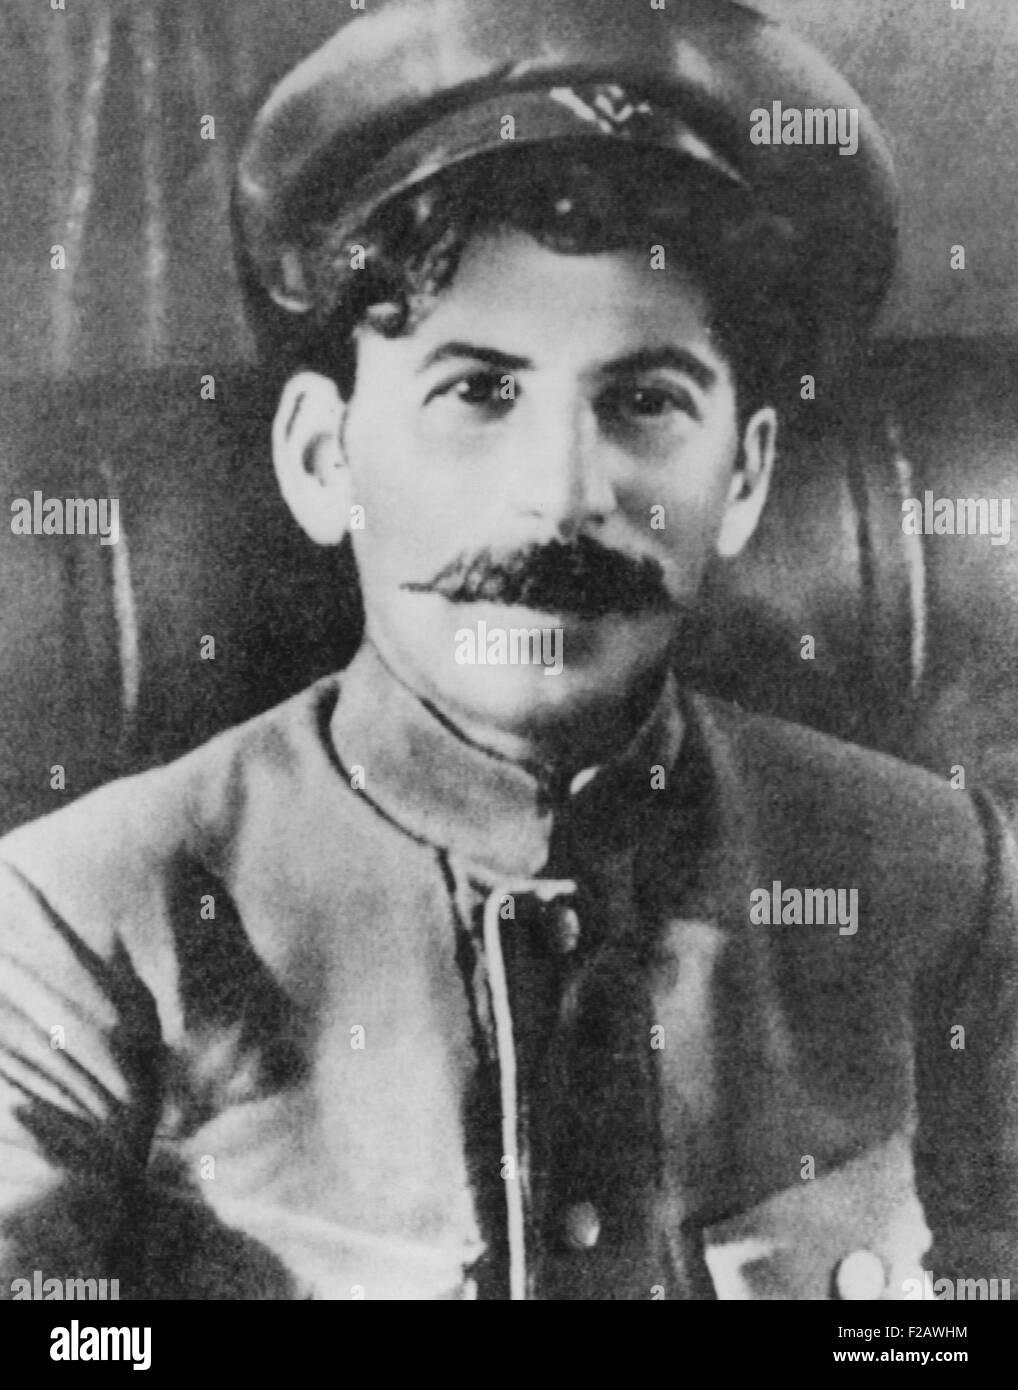 Josef Stalin as a Soviet Revolutionary during World War 1. Ca. 1915. (CSU_2015_11_1370) - Stock Image